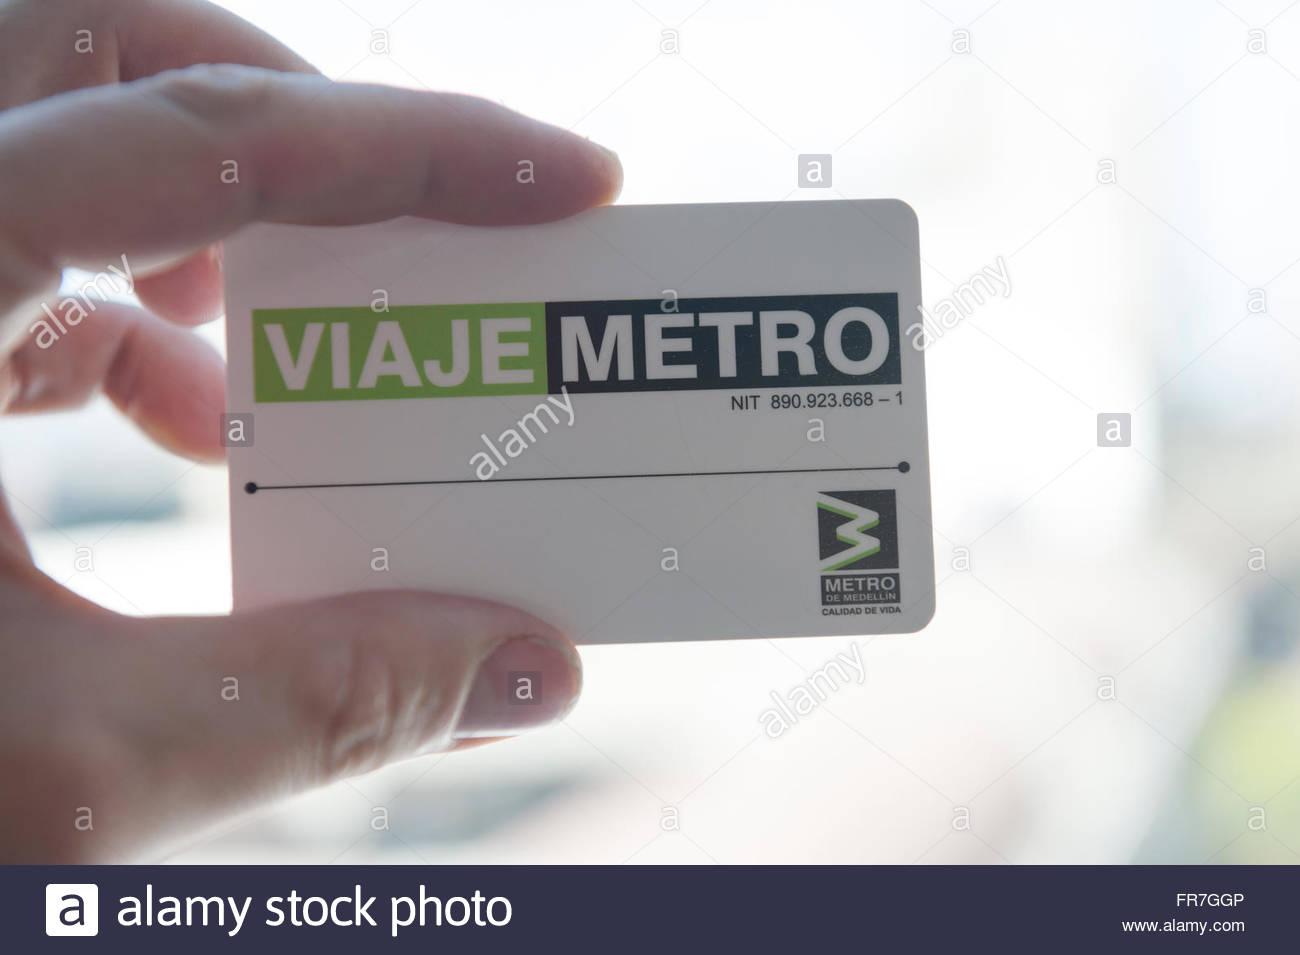 Medellin Colombie Metro system travel pass. Photo Stock